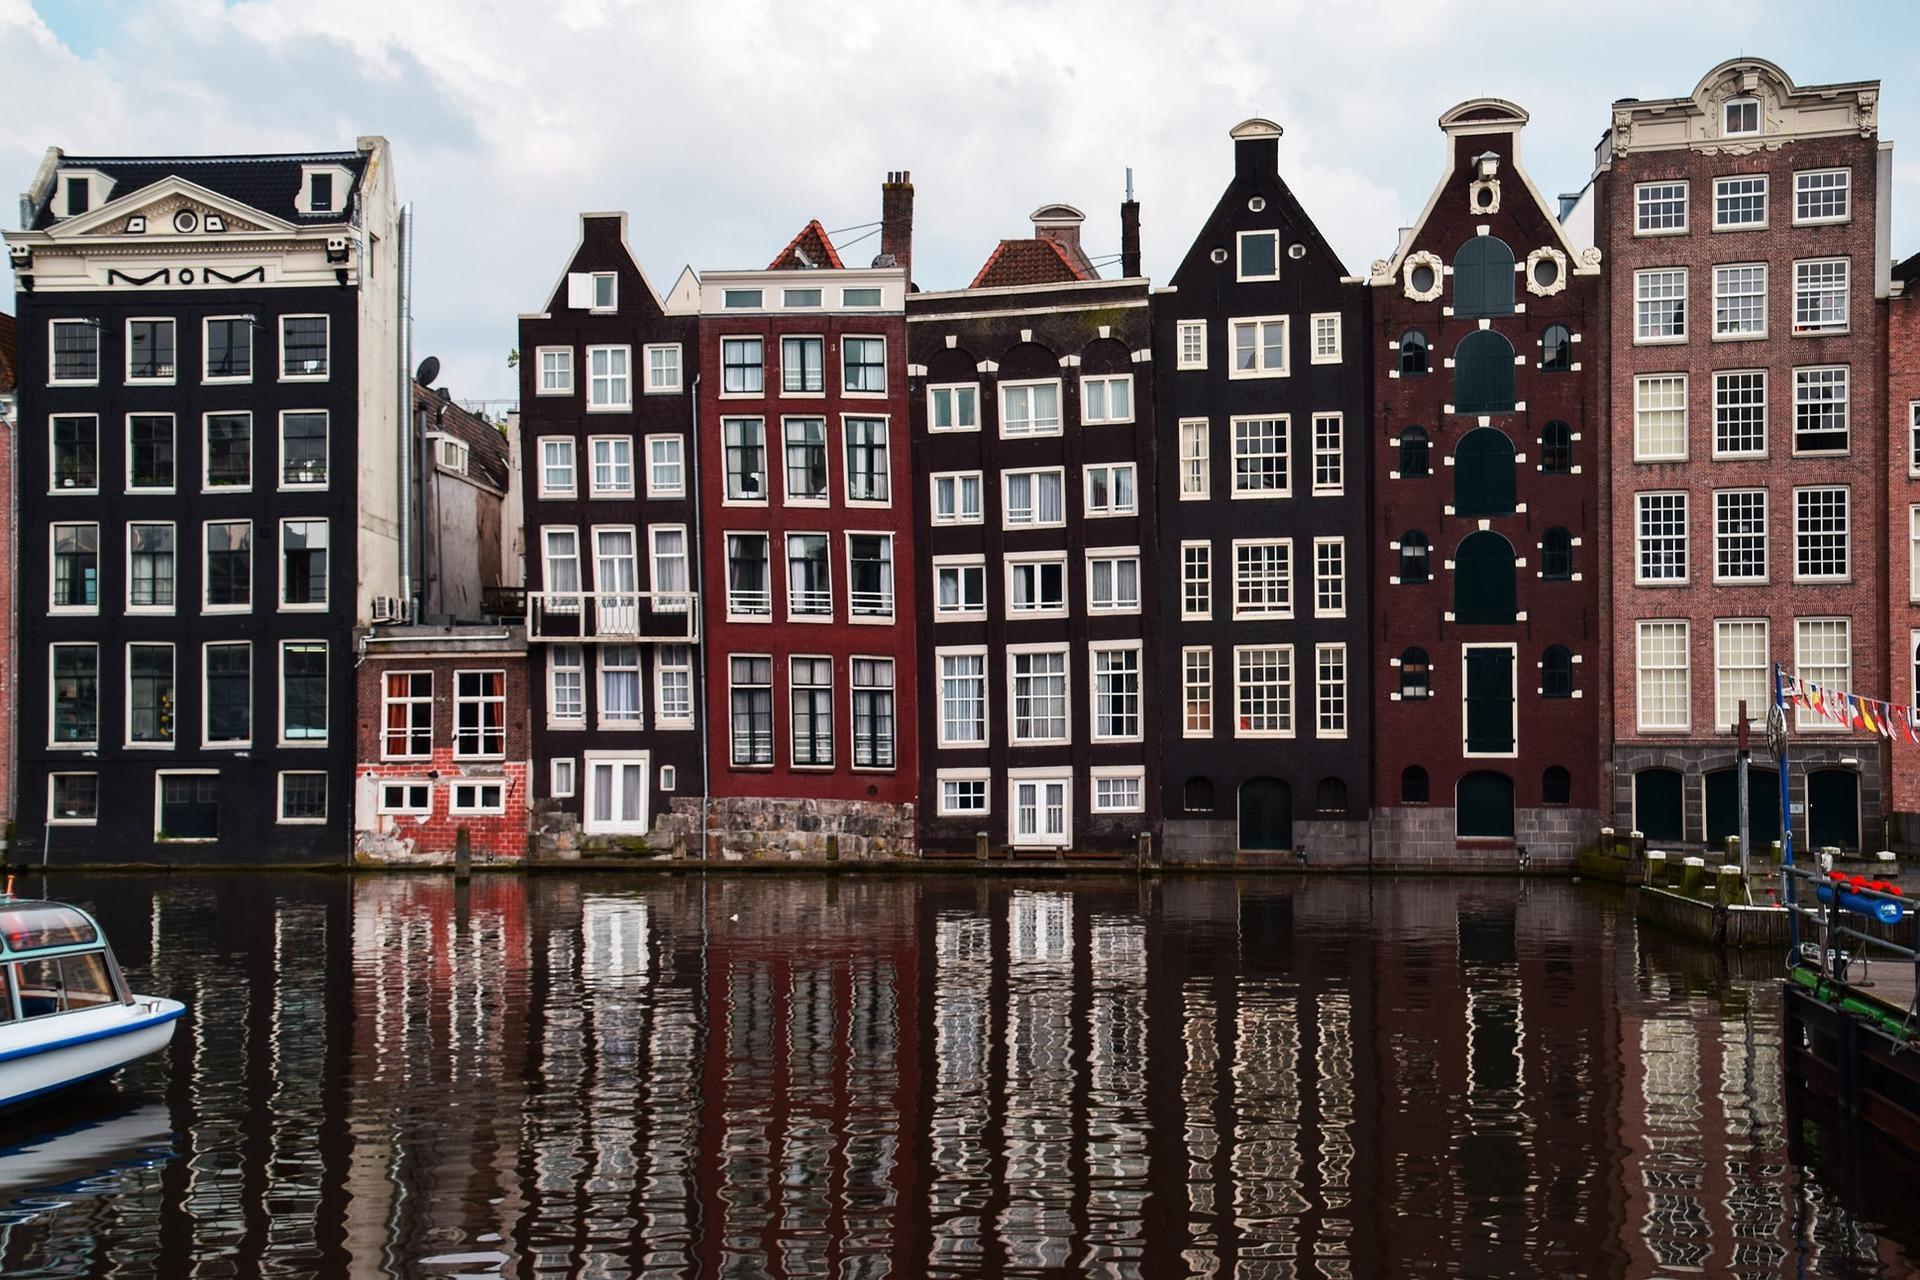 amsterdam-1682963_1920 (1)